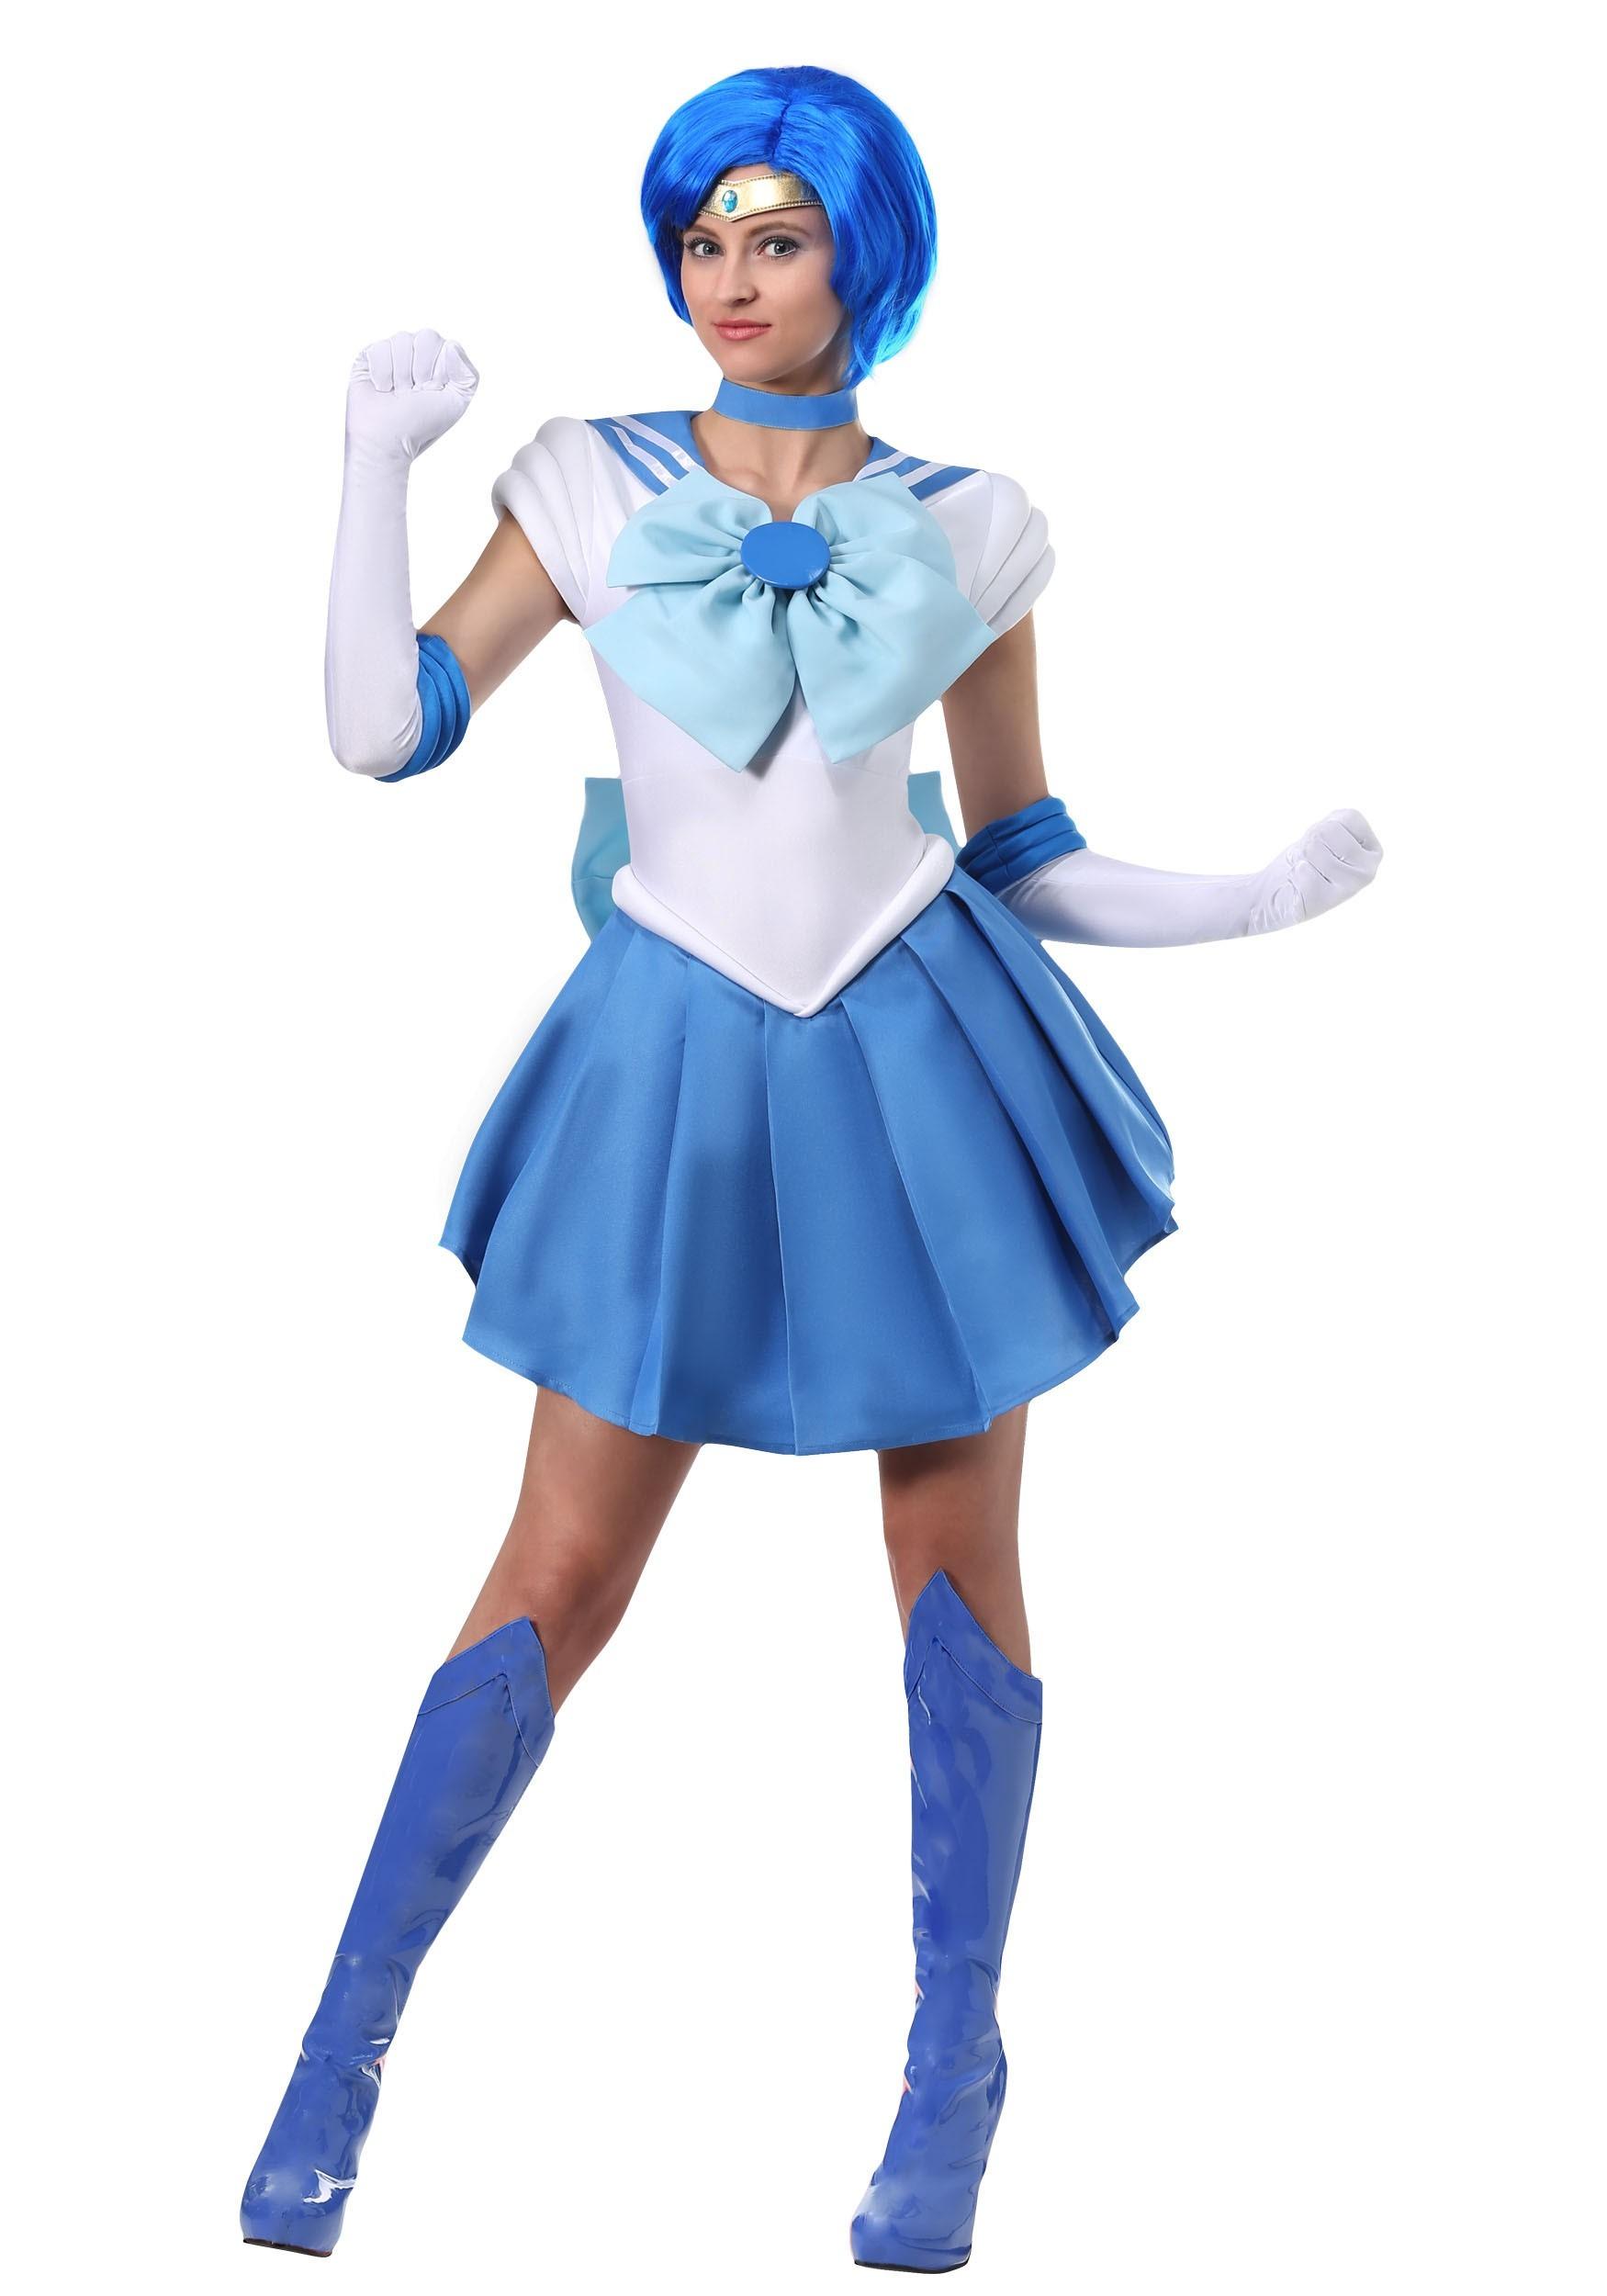 Sailor Mercury Costume for Women   Cosplay Costume for Women's